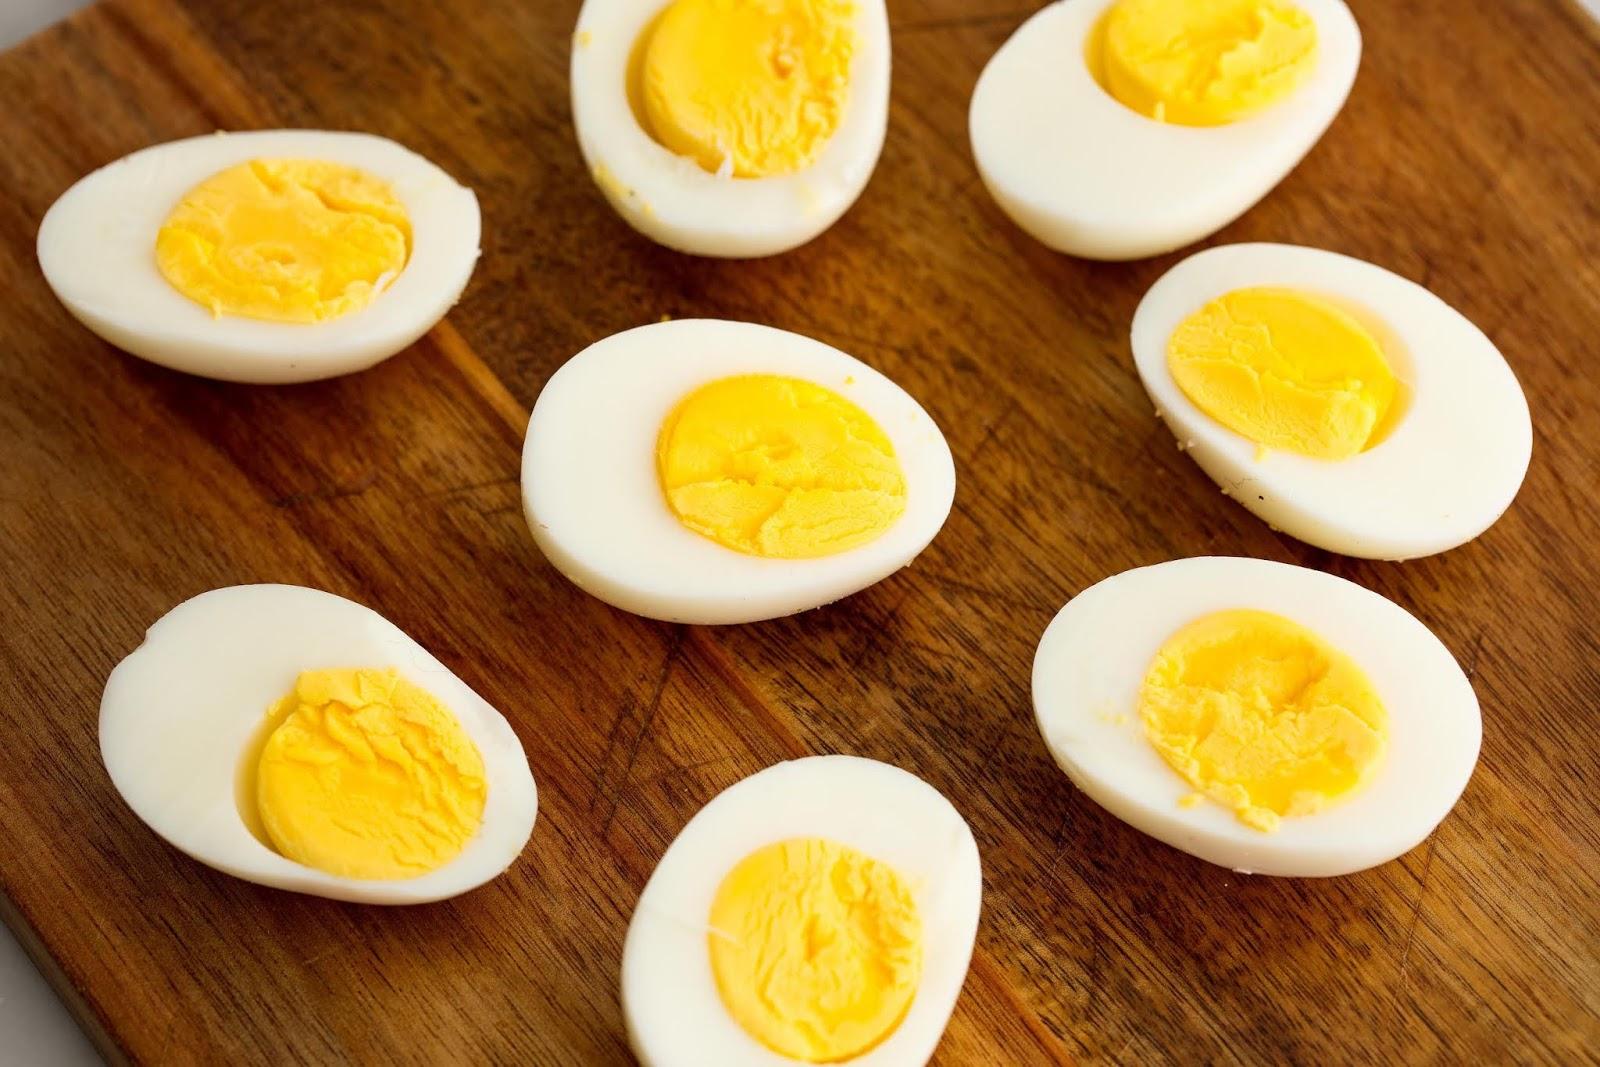 egg, health, সকালের নাস্তায় সেদ্ধ ডিমের উপকারিতা